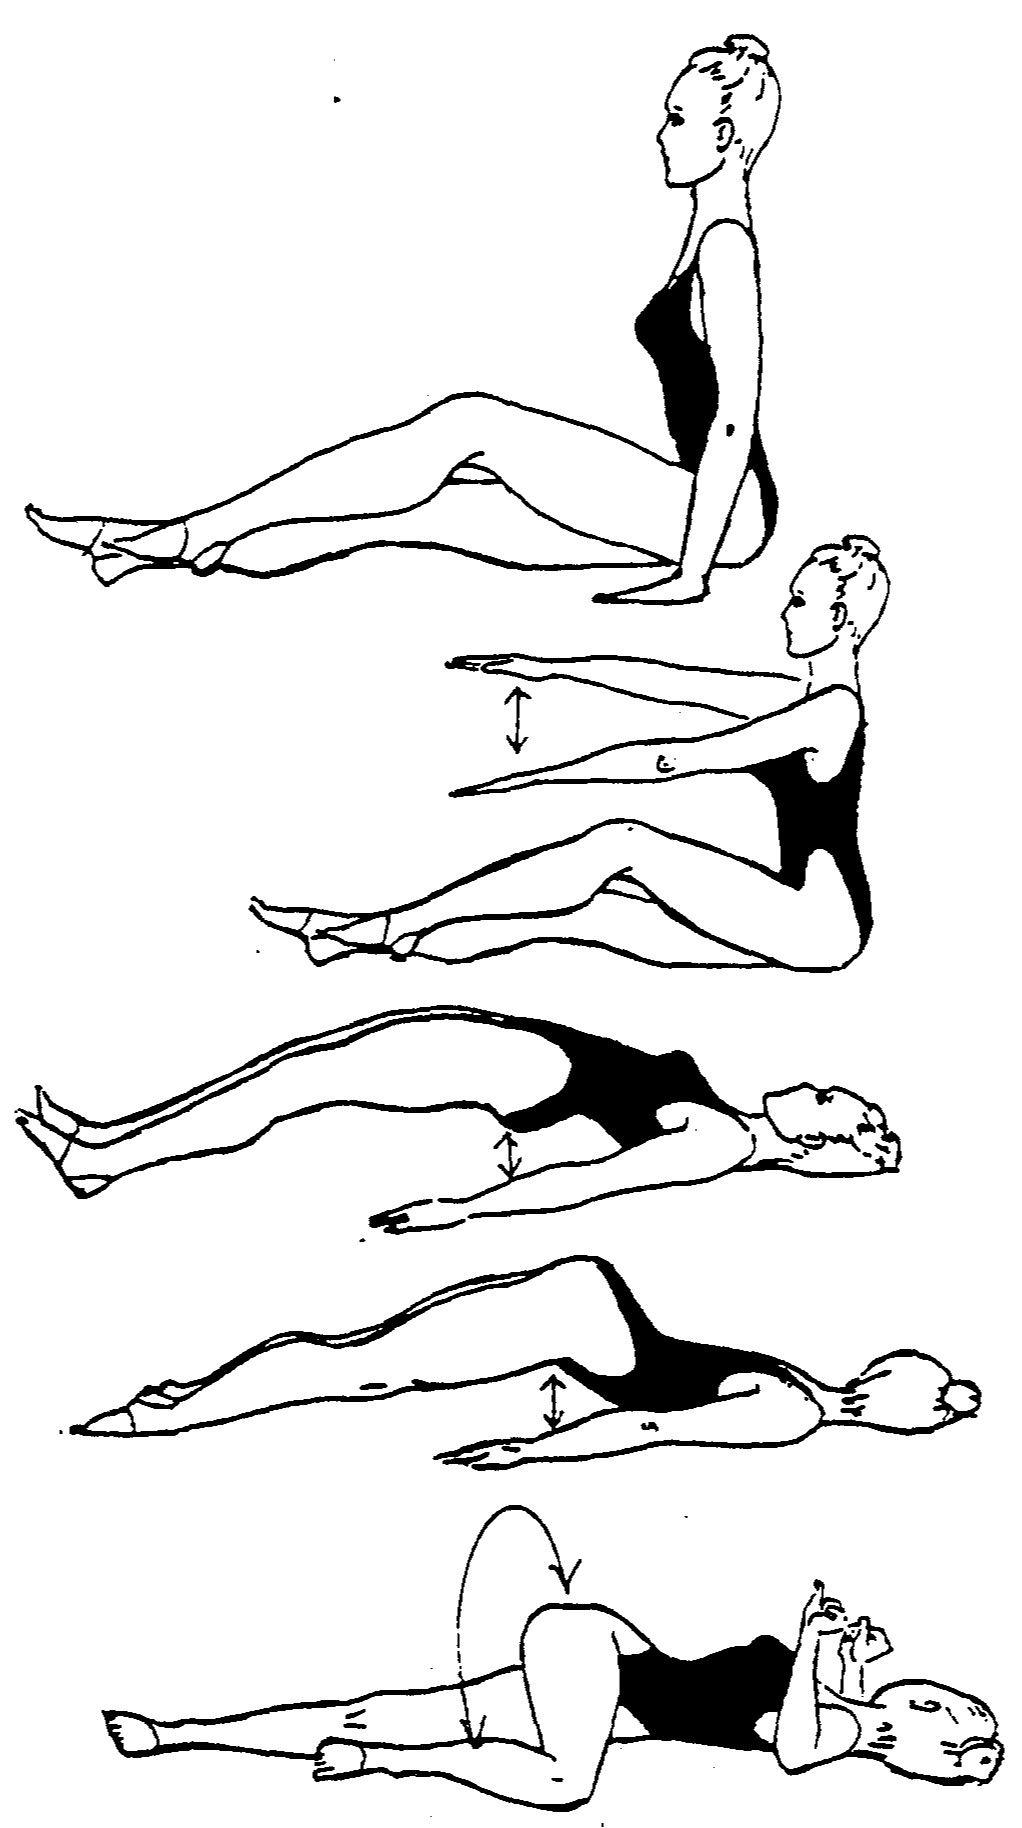 Kundalini Yoga for the skin  Kundalini yoga, Kriya yoga, Kundalini